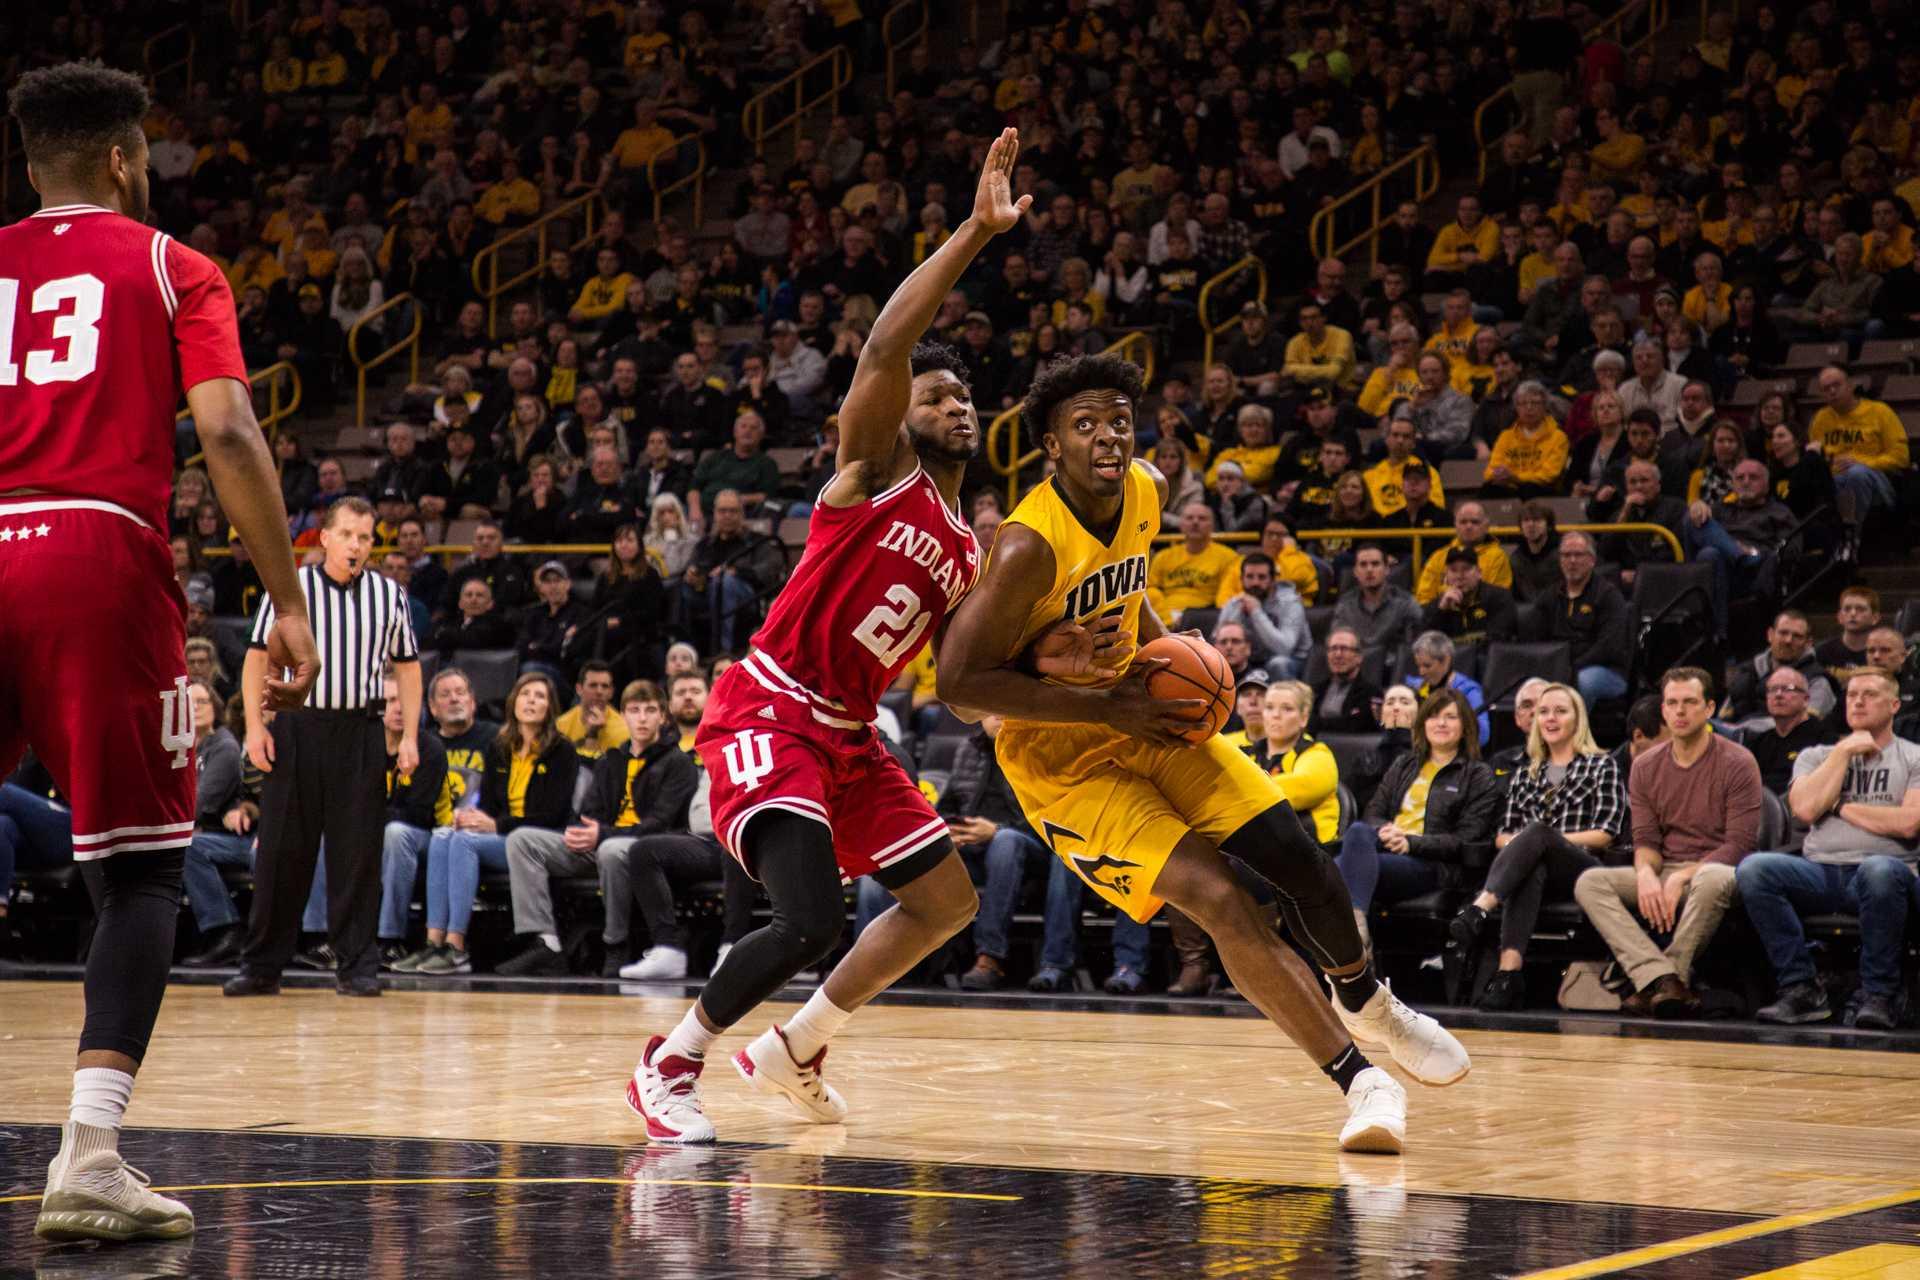 Hawkeye basketball benefiting from NBA hopefuls